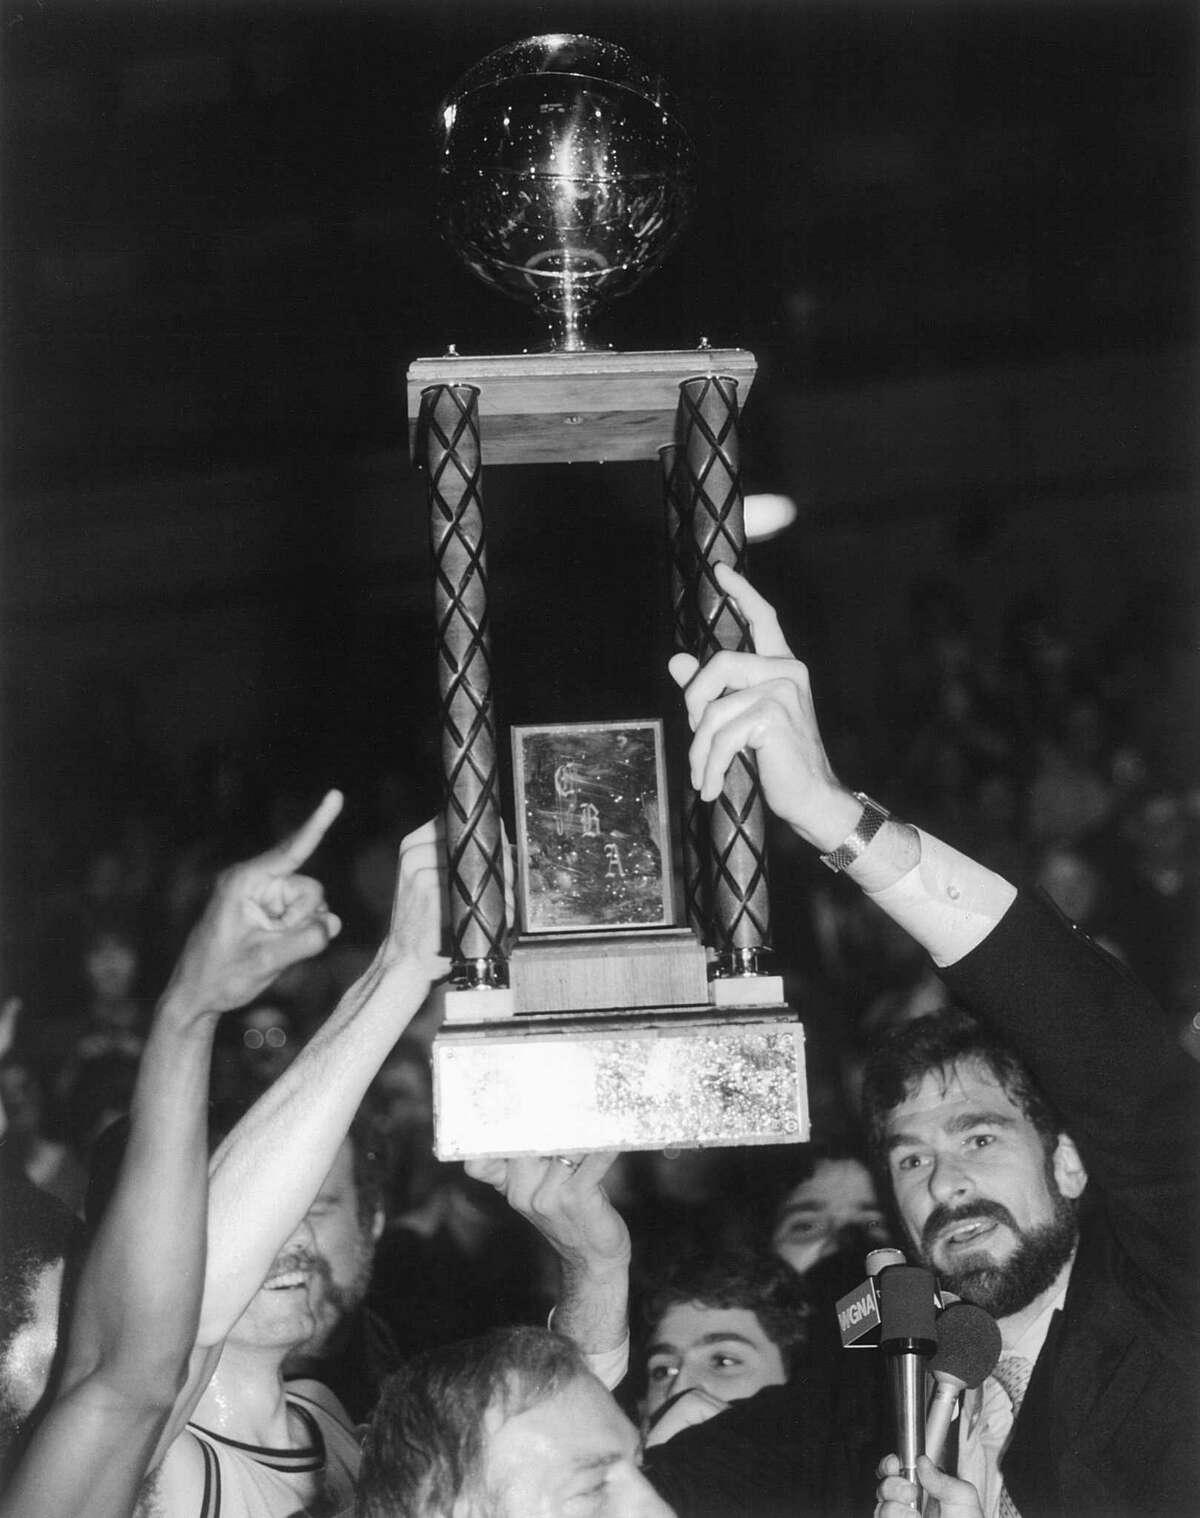 The Albany Patroons' 1984 championship celebration. Coach Phil Jackson is at right. (Steve Twardzik/Albany Patroons)